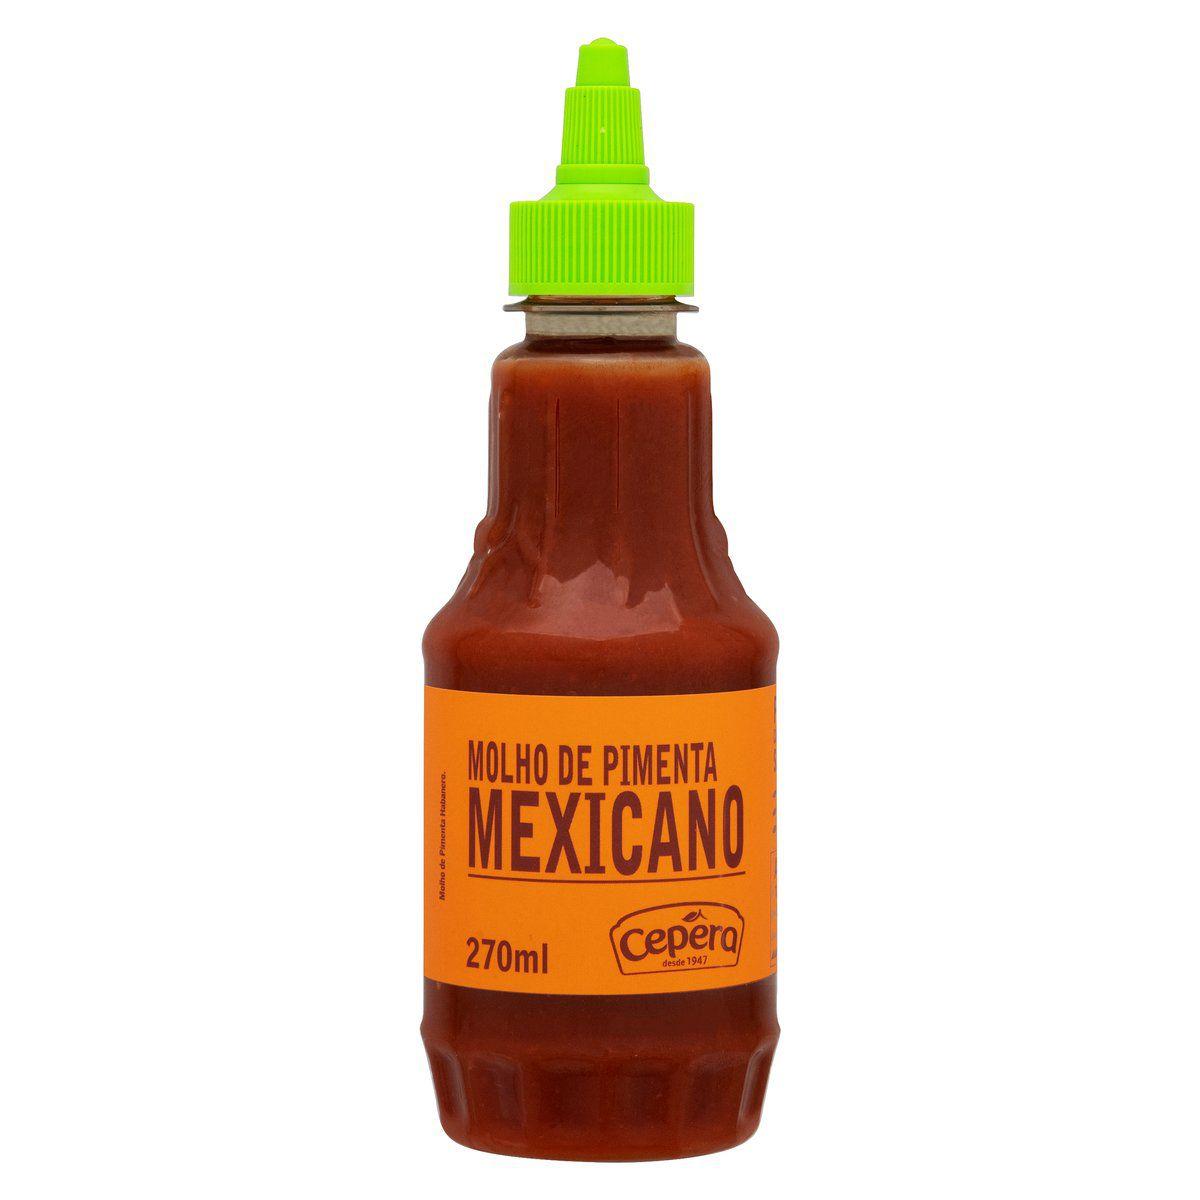 Molho de Pimenta Mexicano 270ml